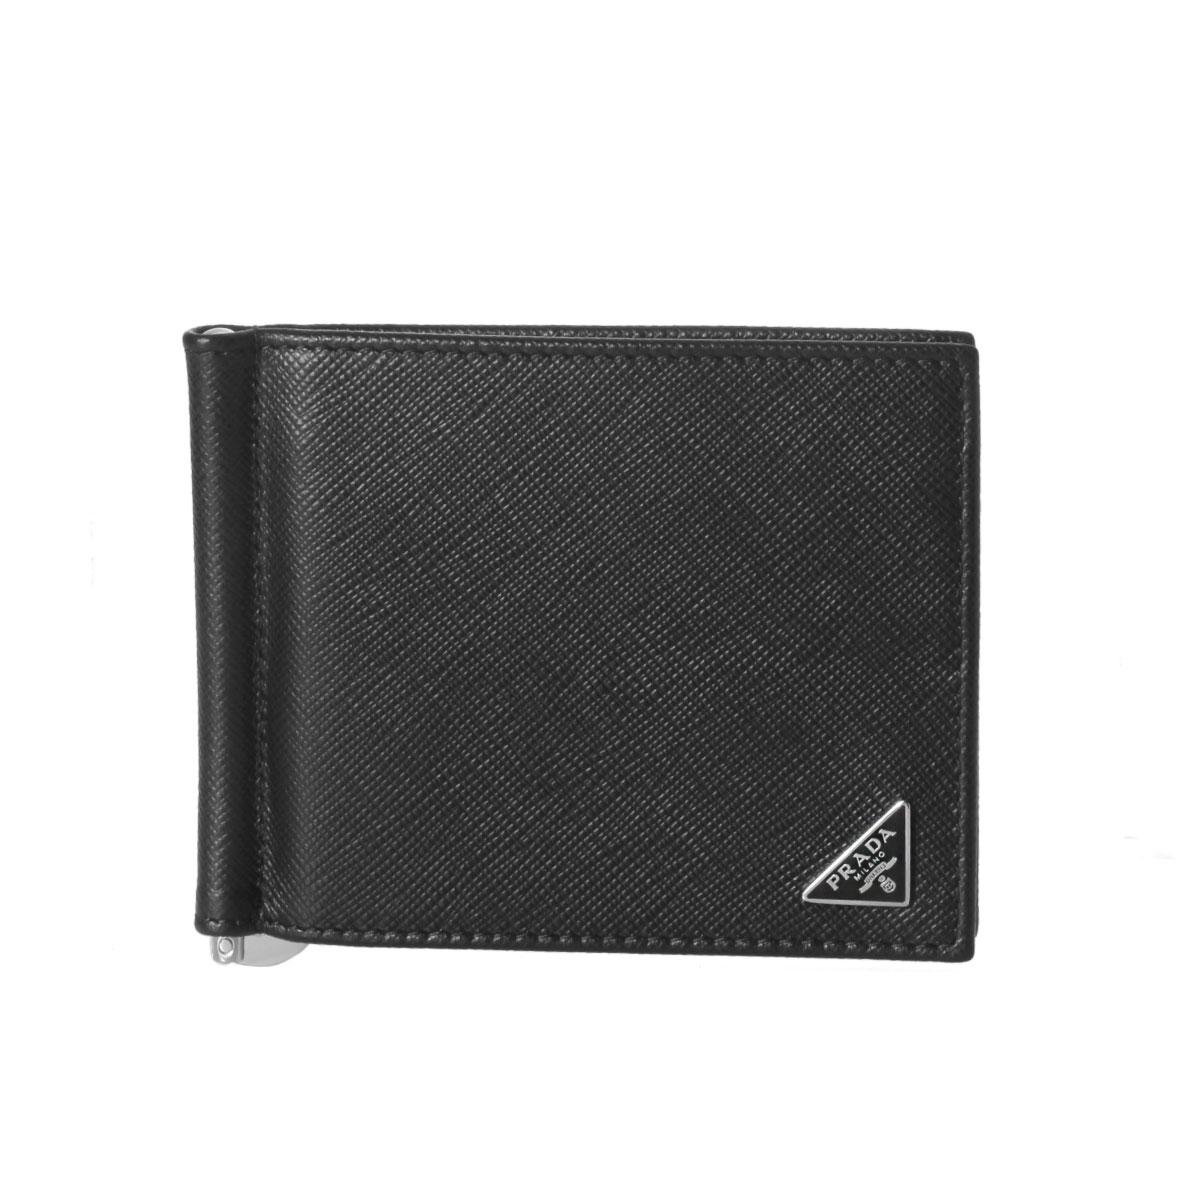 21e1de06775197 importshopdouble: Prada PRADA wallet men 2MN077 QHH F0002 folio wallet  SAFFIANO TRIANGOLO NERO black | Rakuten Global Market